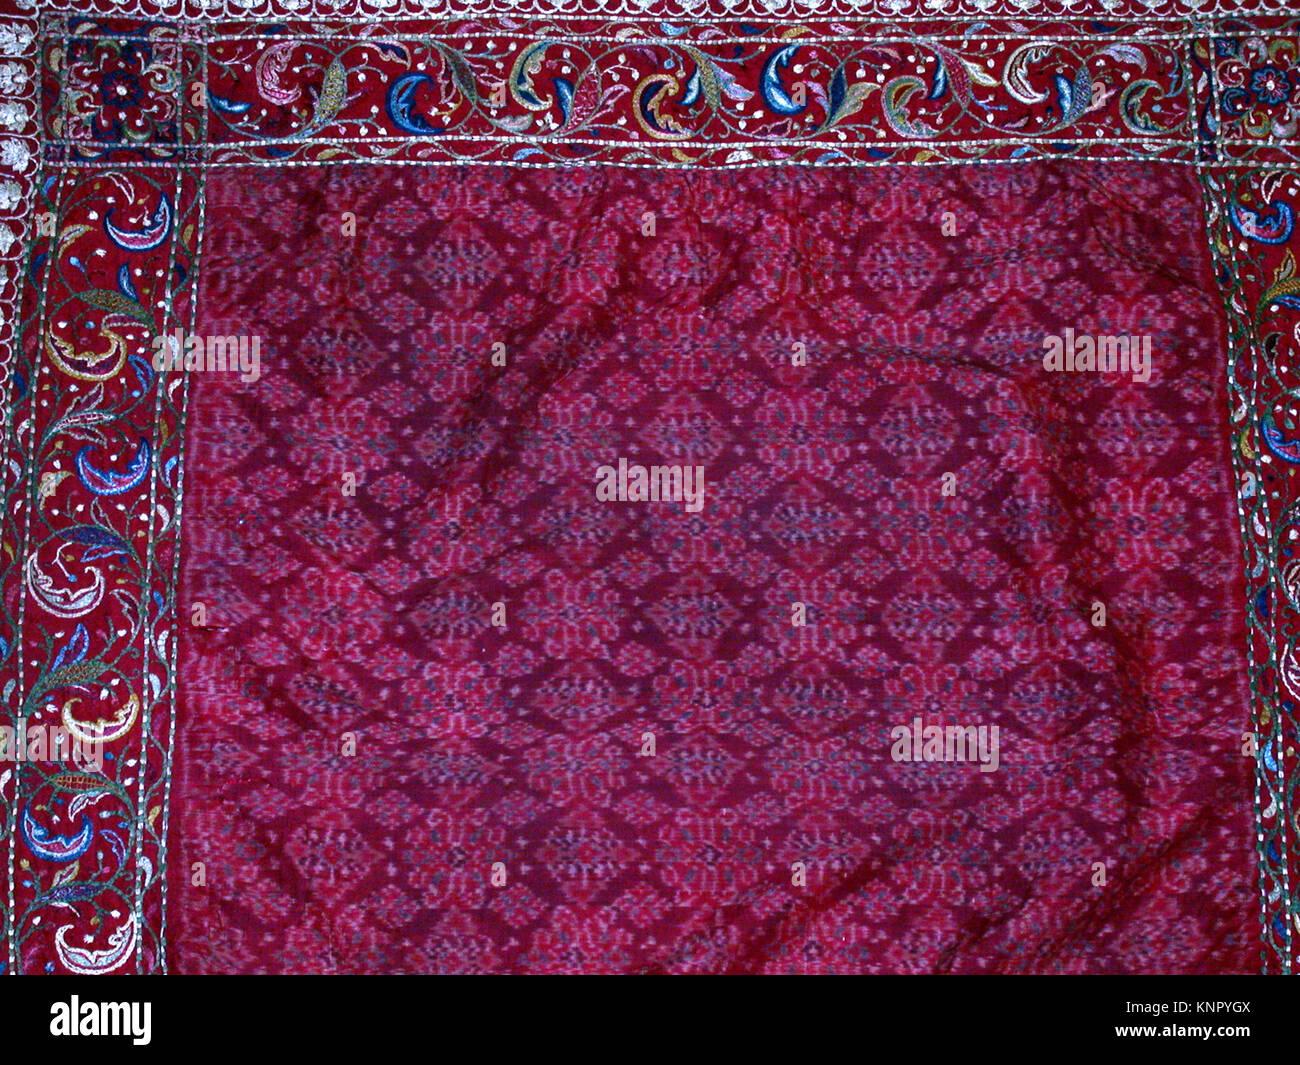 Headcloth MET vs69.12.4b 309546 - Stock Image